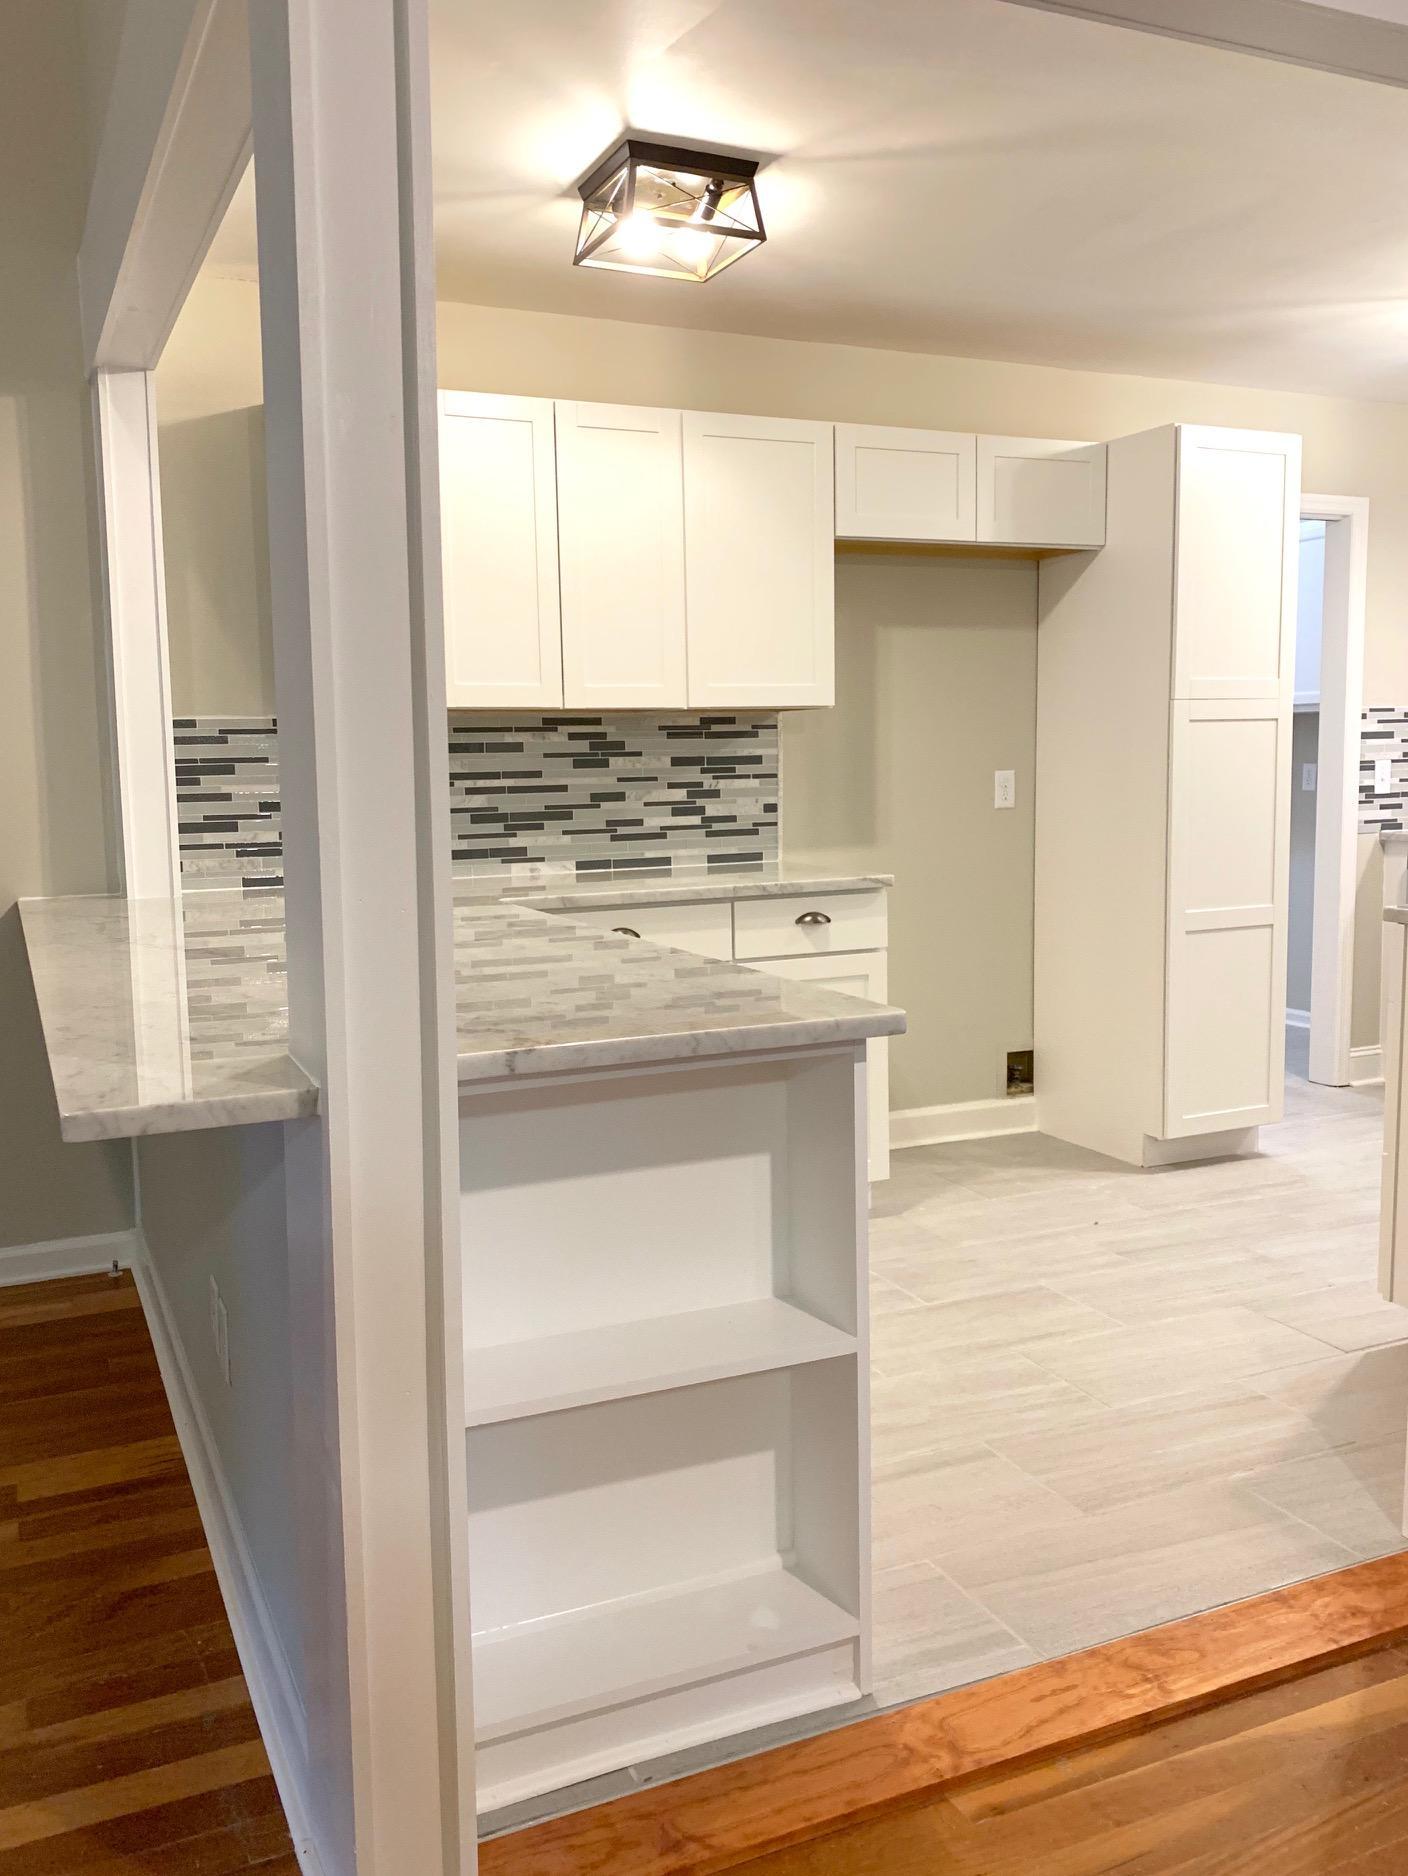 Gahagan Homes For Sale - 114 Garbon, Summerville, SC - 8